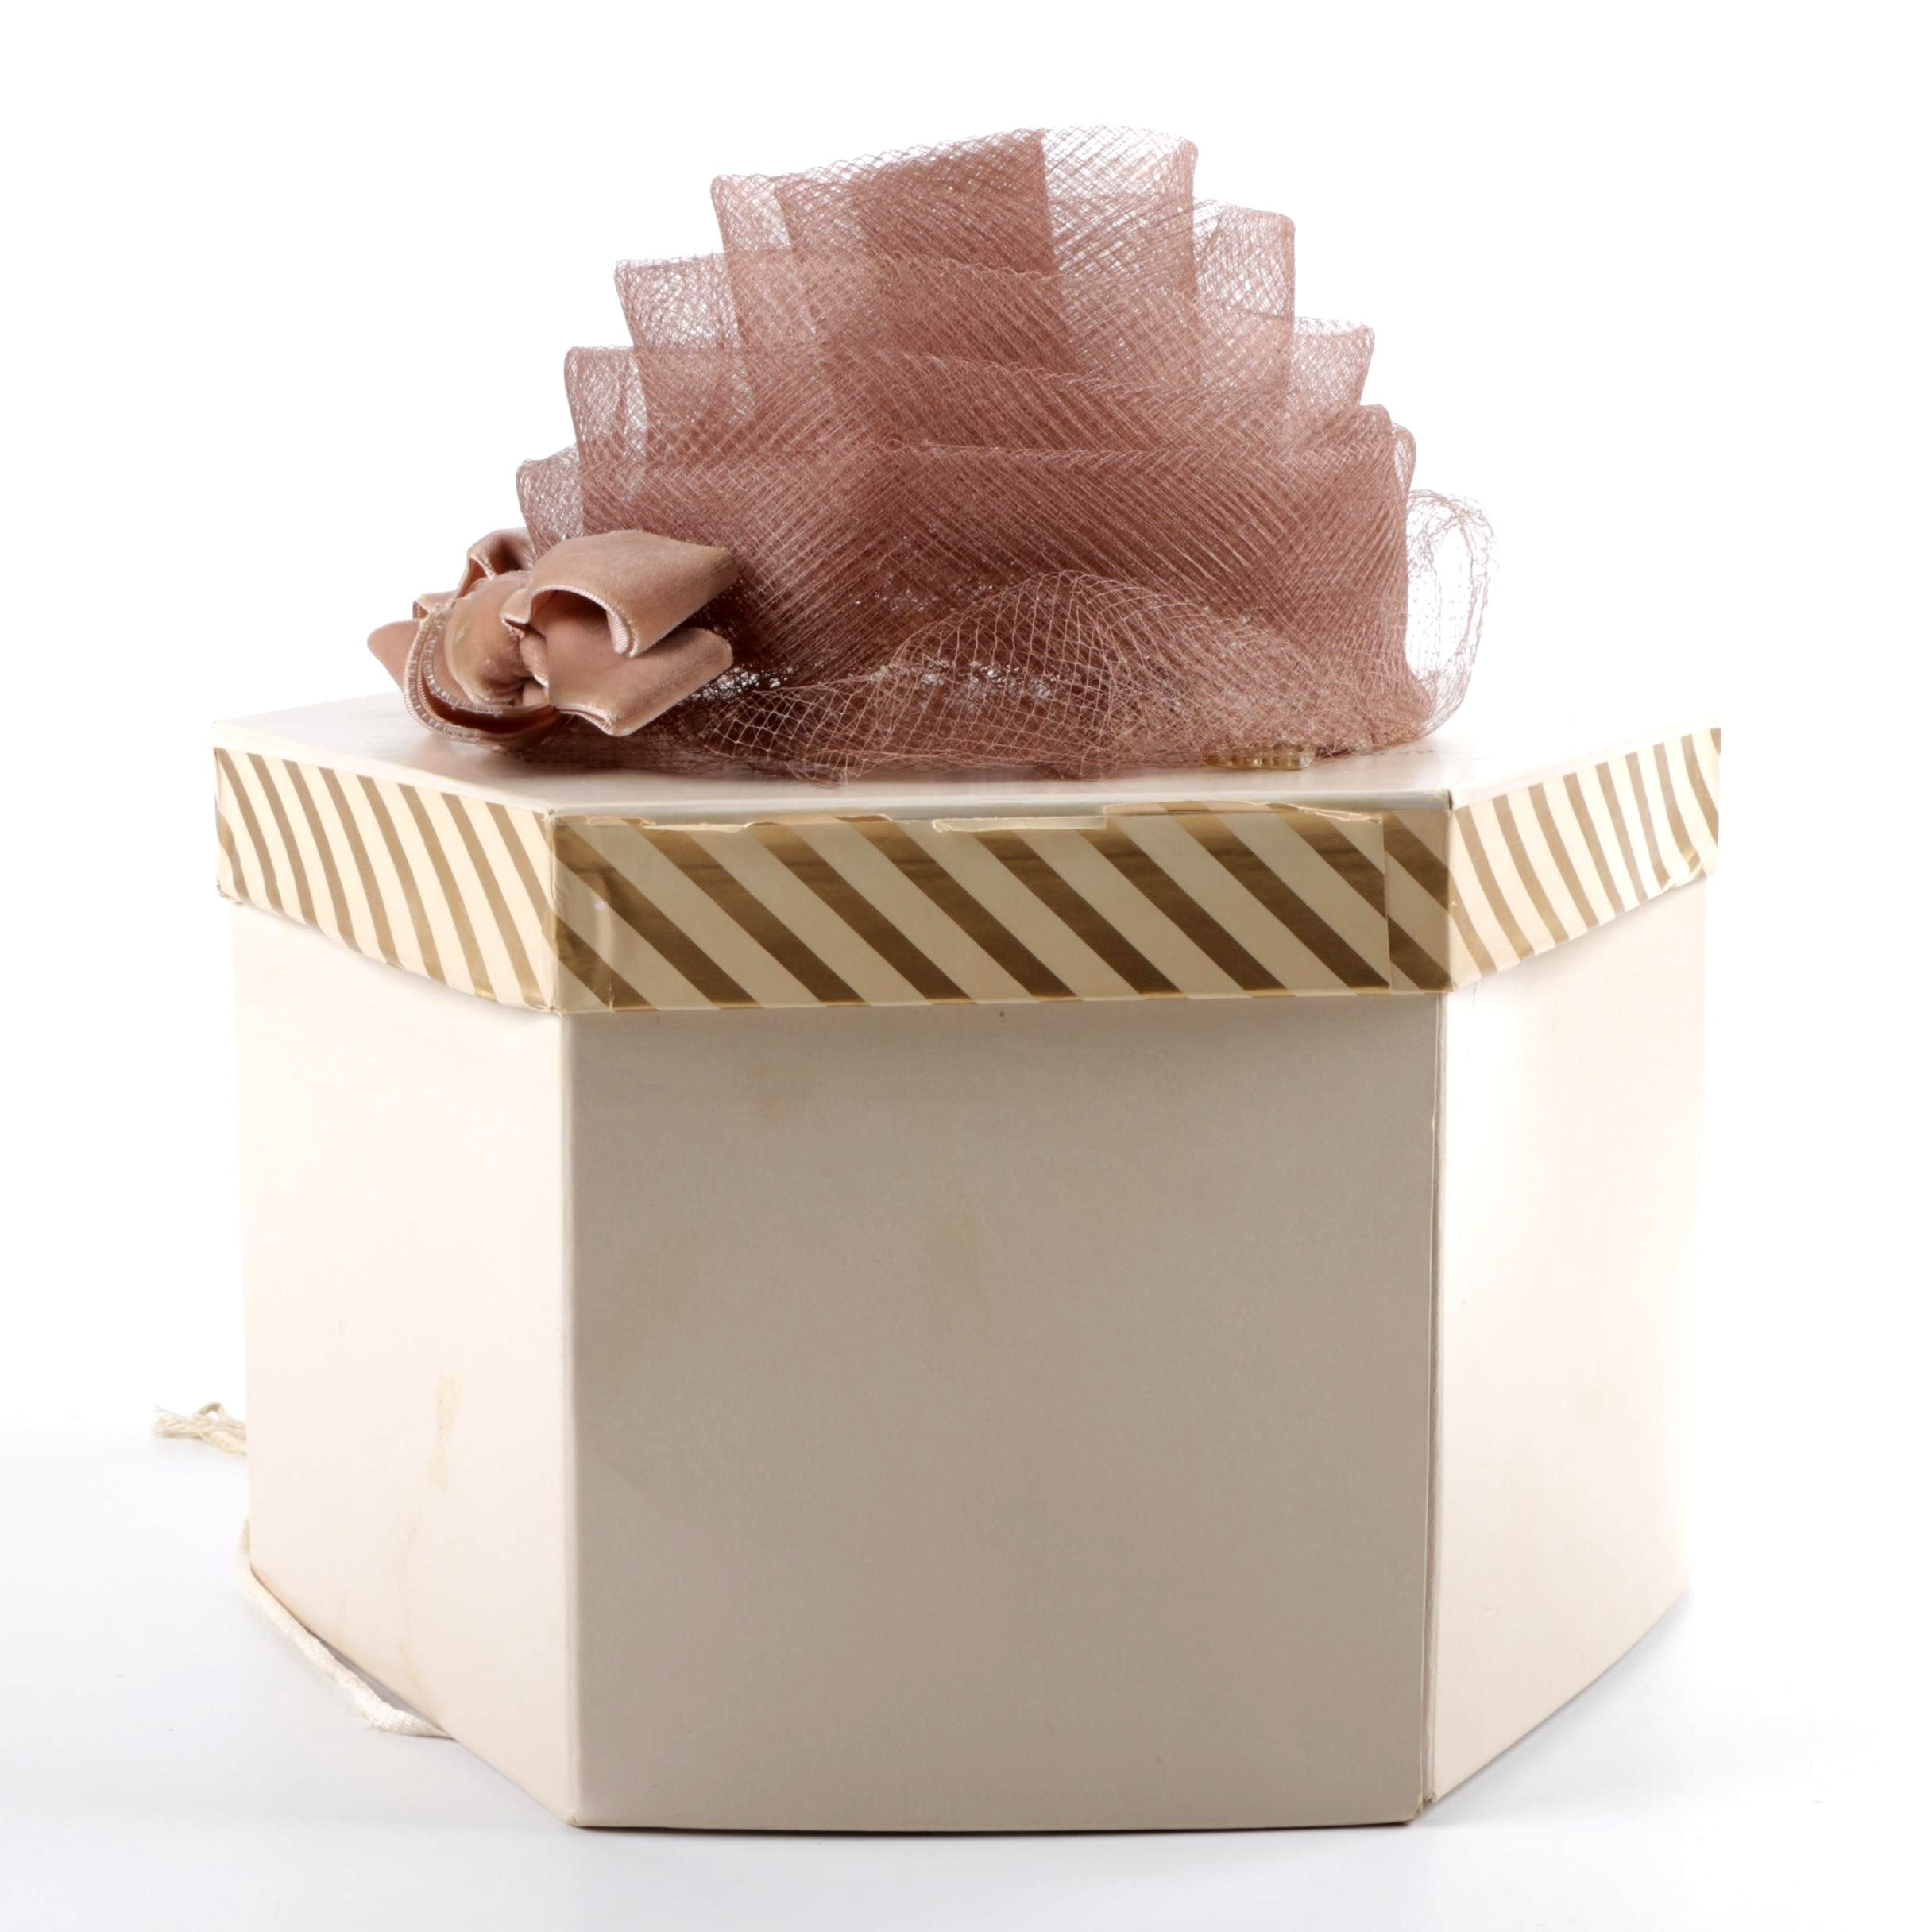 Vintage Kurli-Kutes Taupe Mesh Turban Hat with Velvet Bow and Hat Box